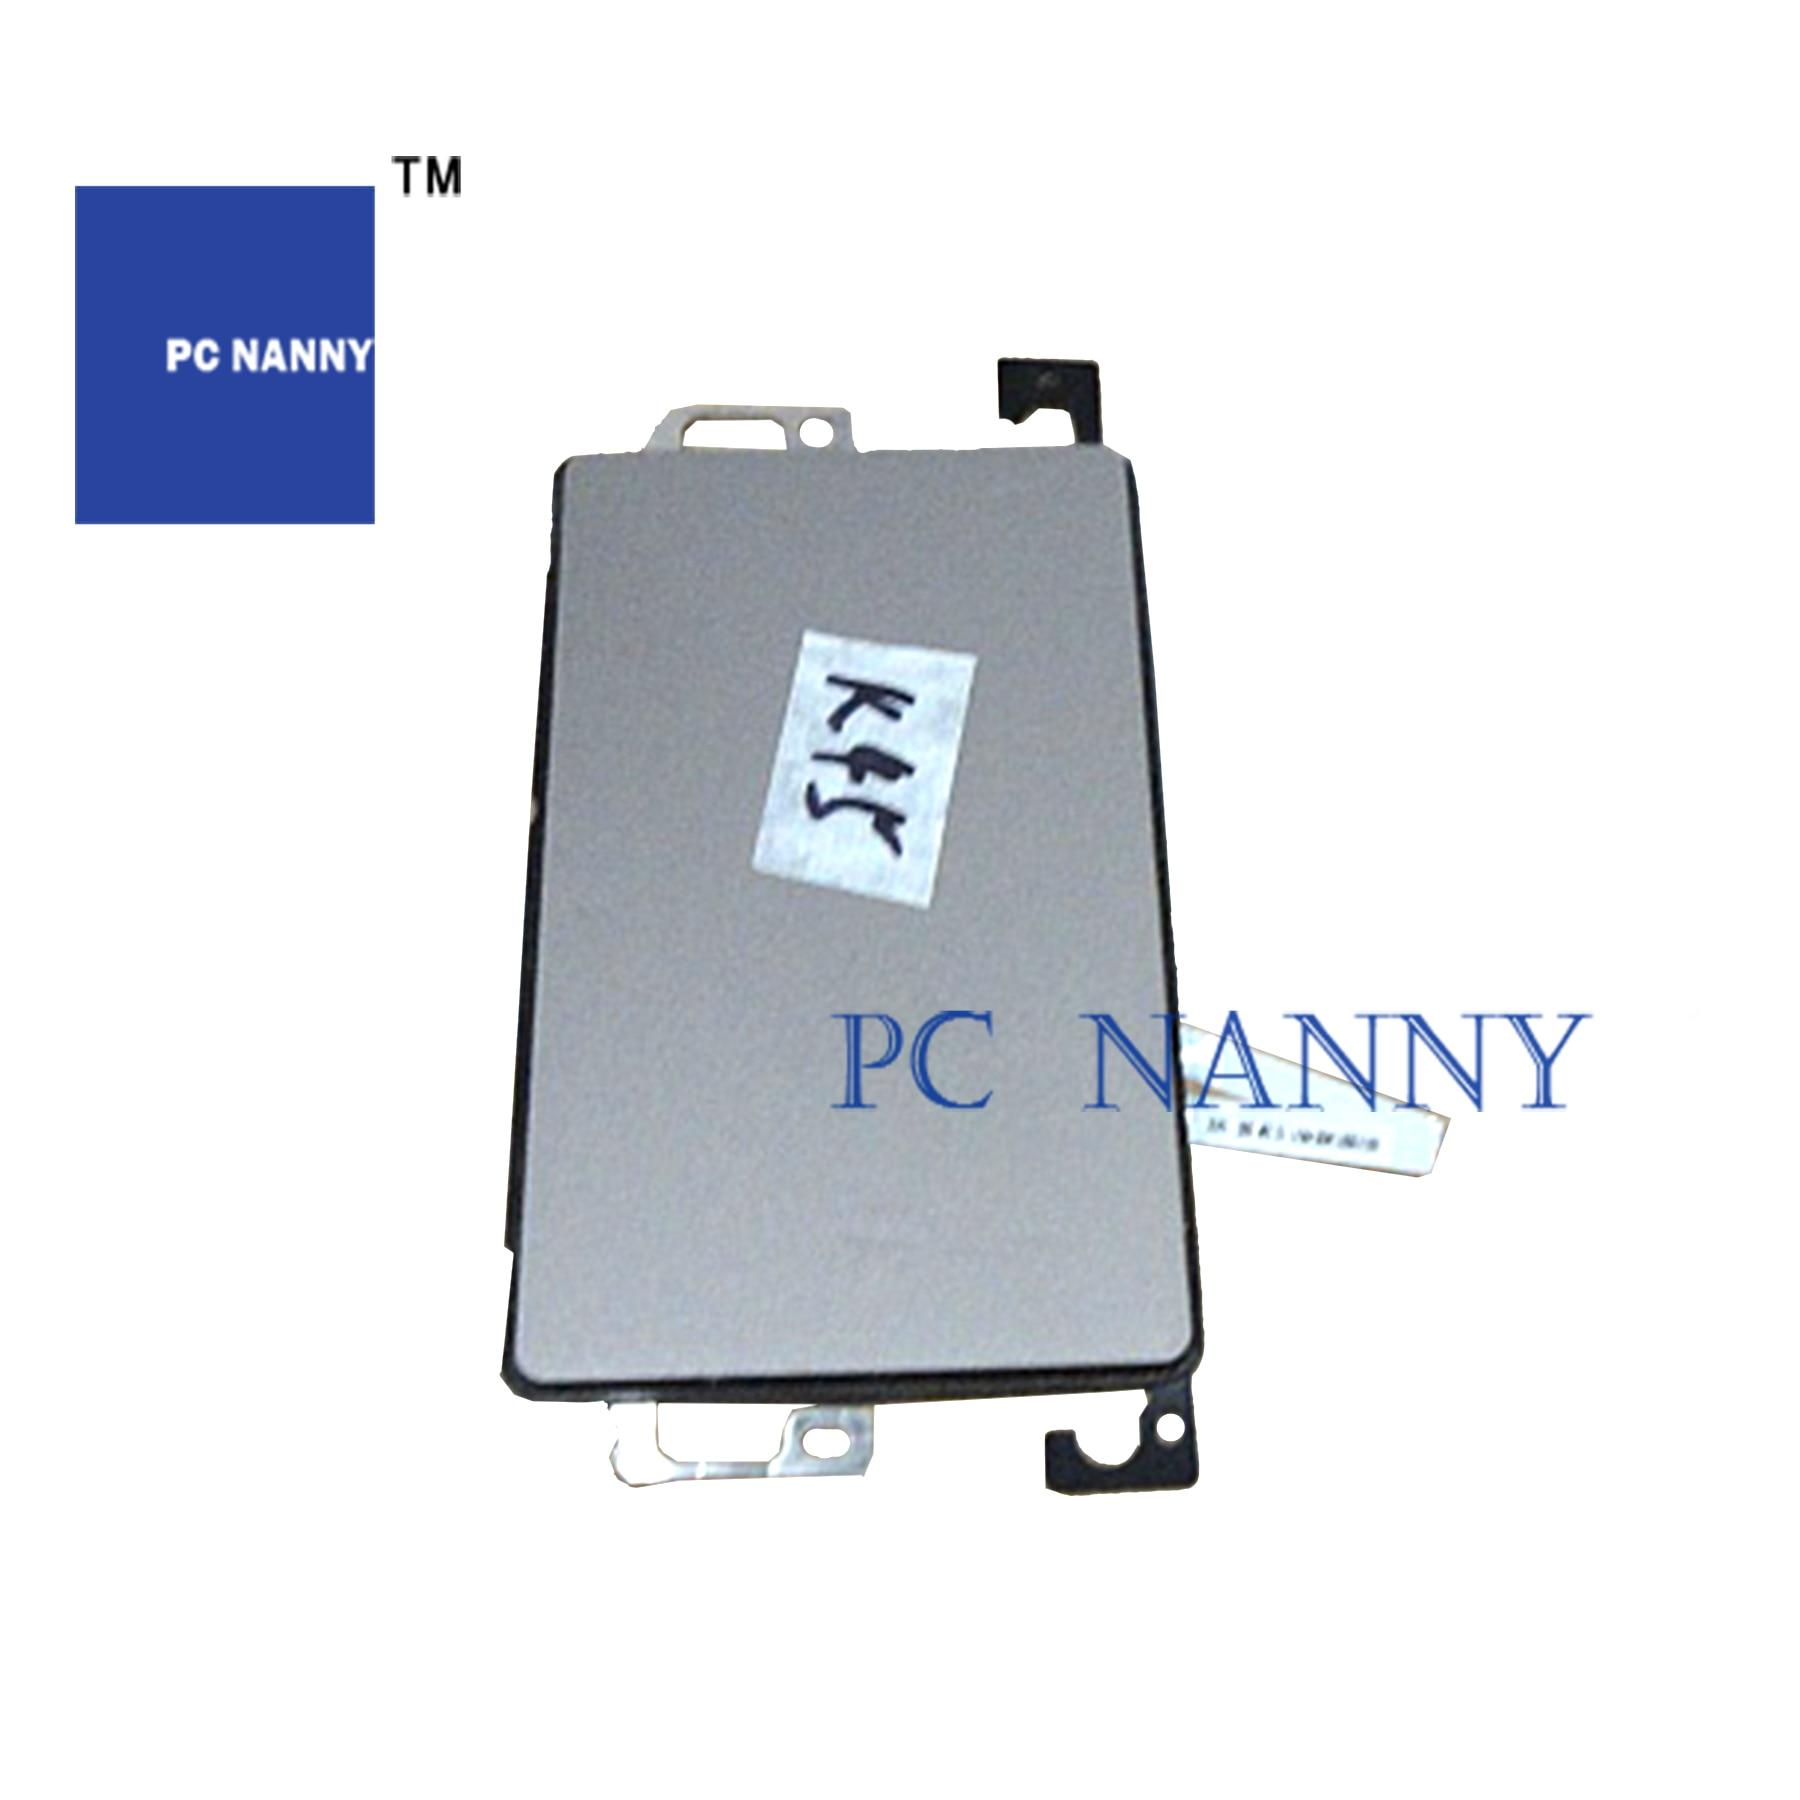 PCNANNY para ASUS K45 K45v P45V A45V K45VM A85V P45VJ touchpad altavoces usb board